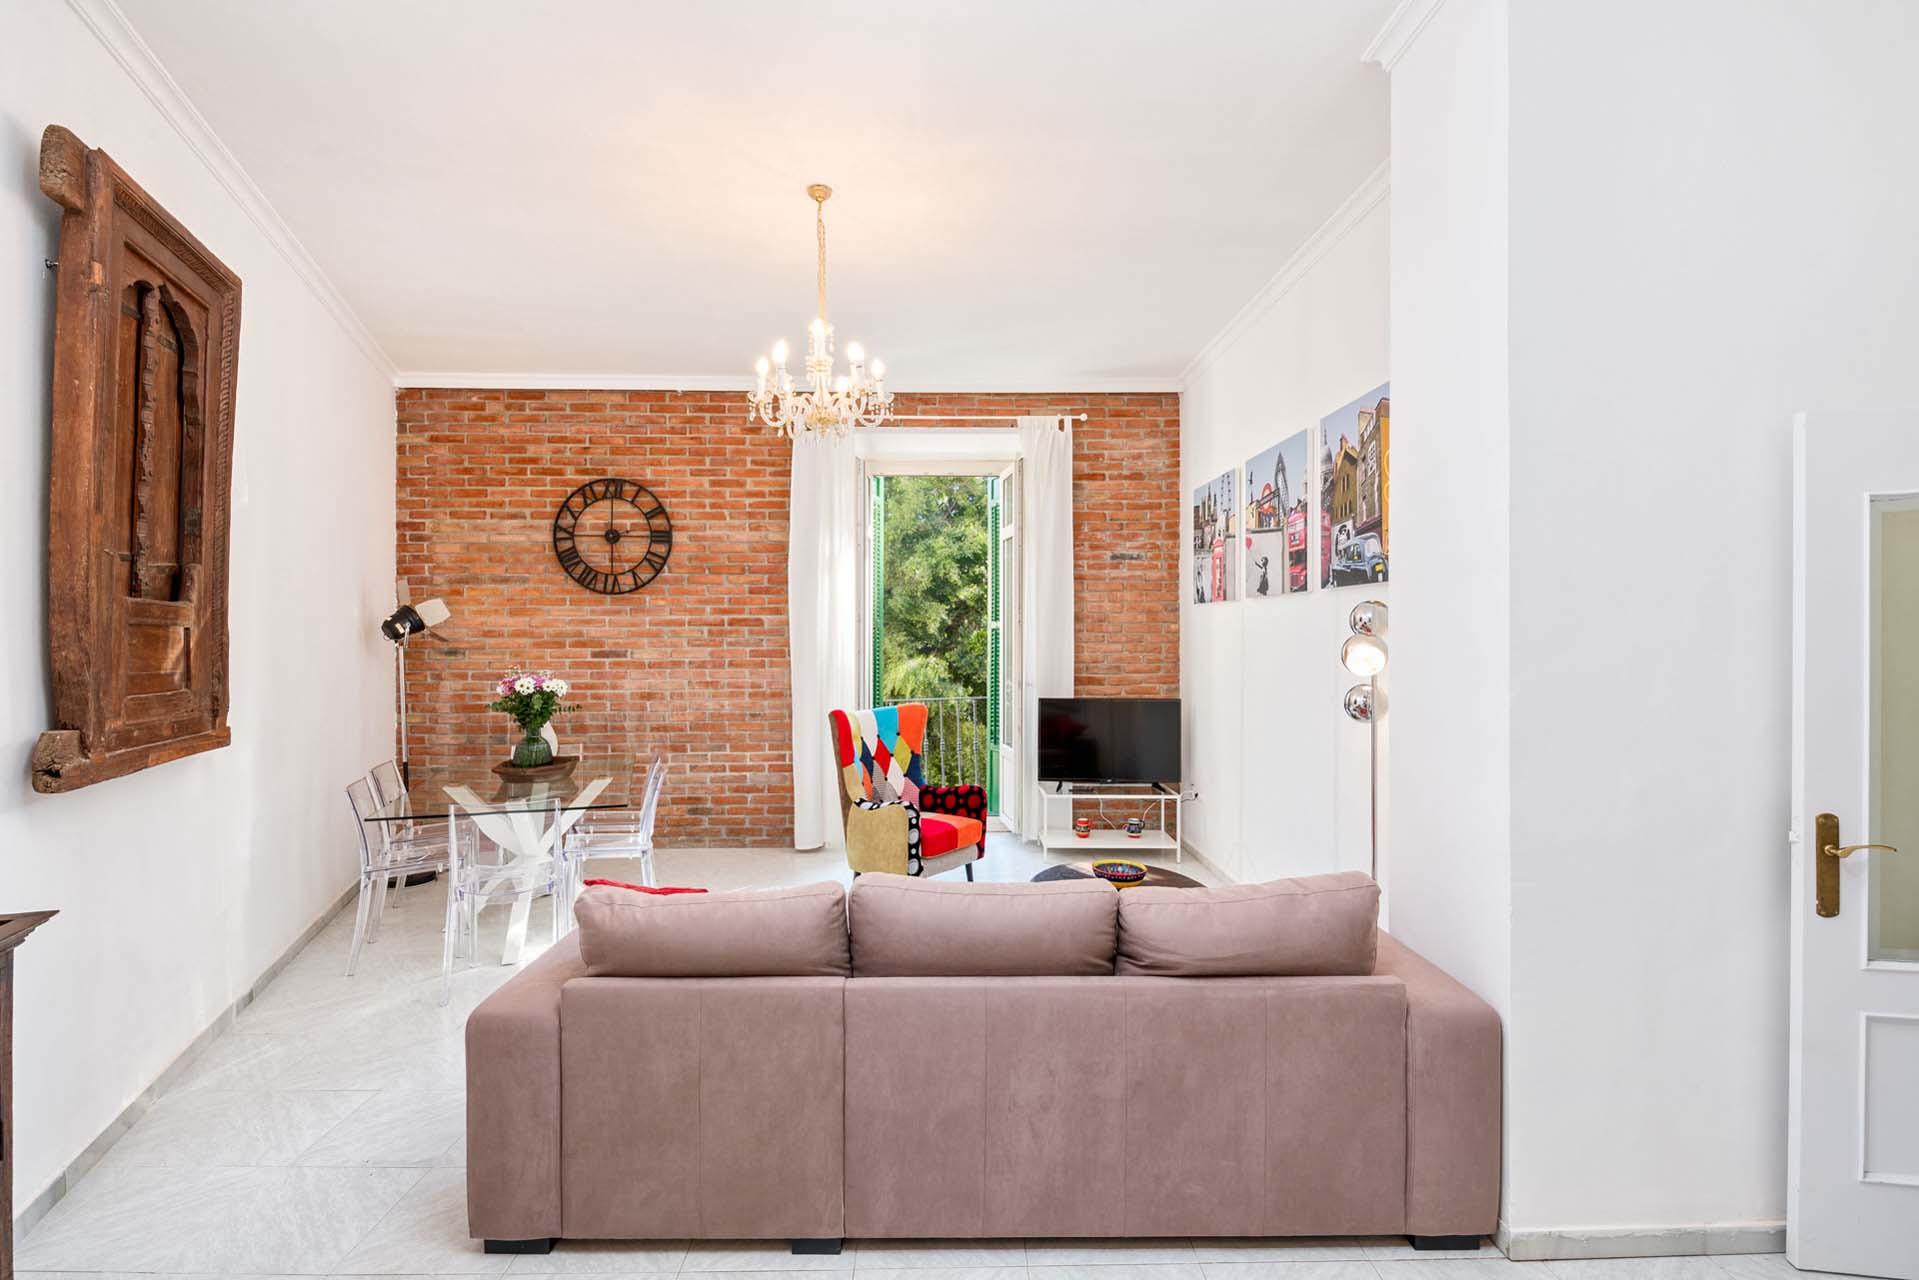 Amplio piso de 3 dormitorios en pleno centro hist rico de for Piso 4 dormitorios teatinos malaga